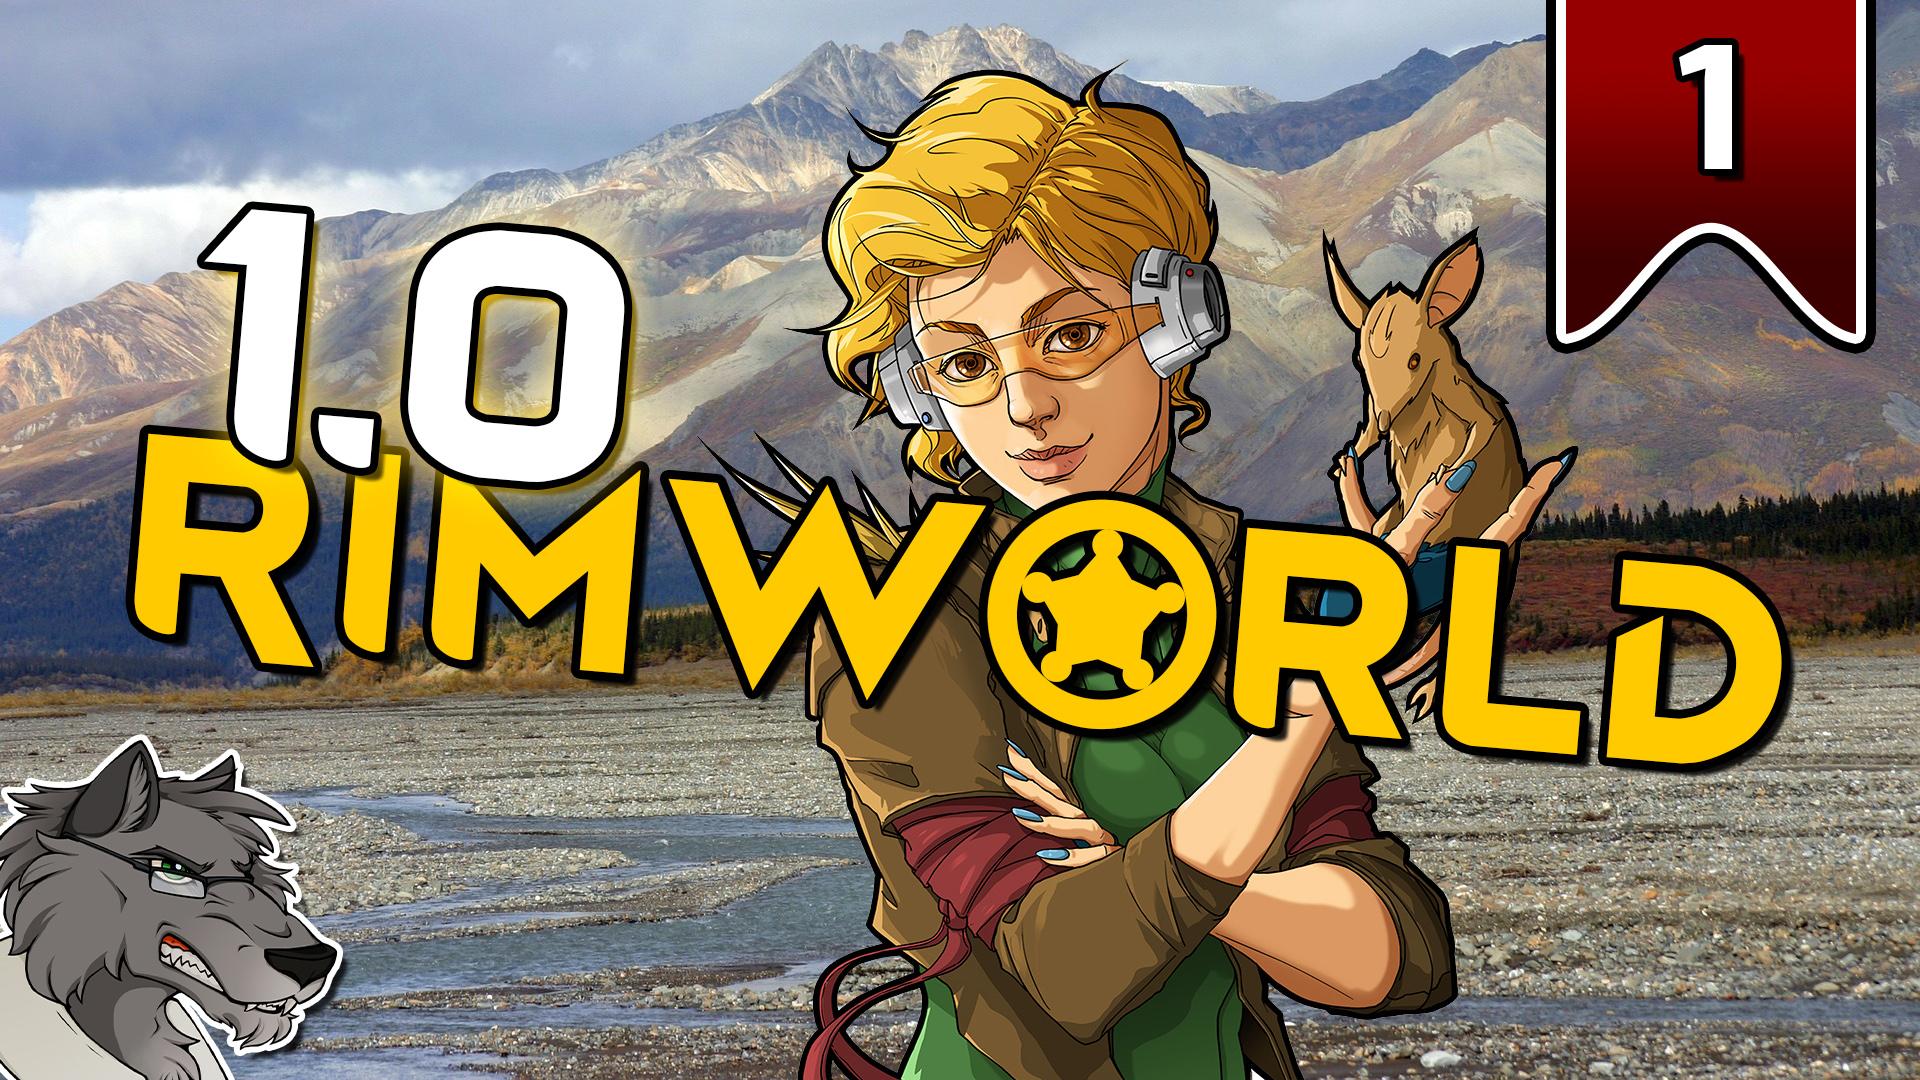 Steam Workshop :: RimWorld (1 0) Tundra Let's Play Modliste